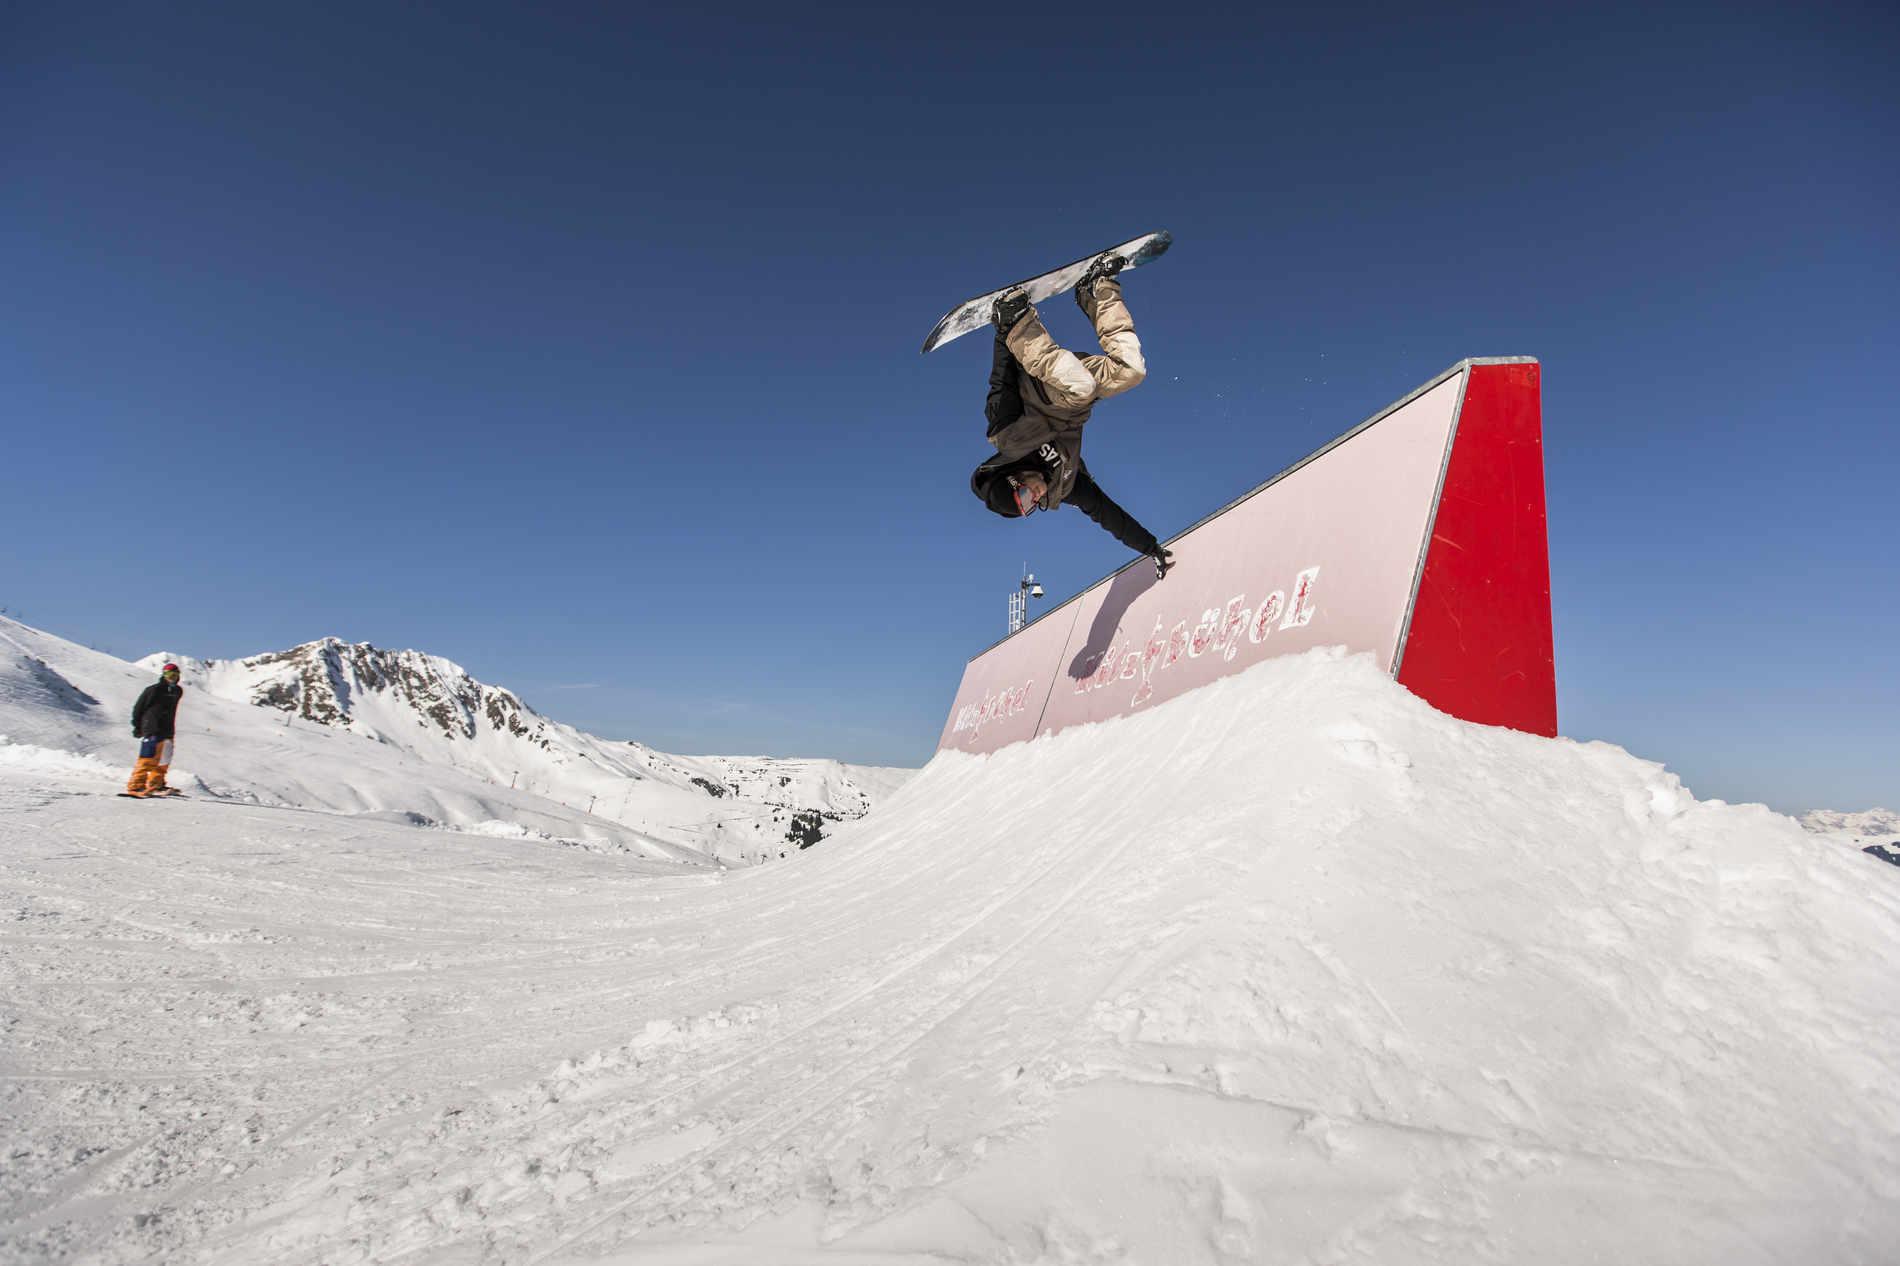 Hightech im Snowpark Kitzbühel – Passion, Profession, Perfektion